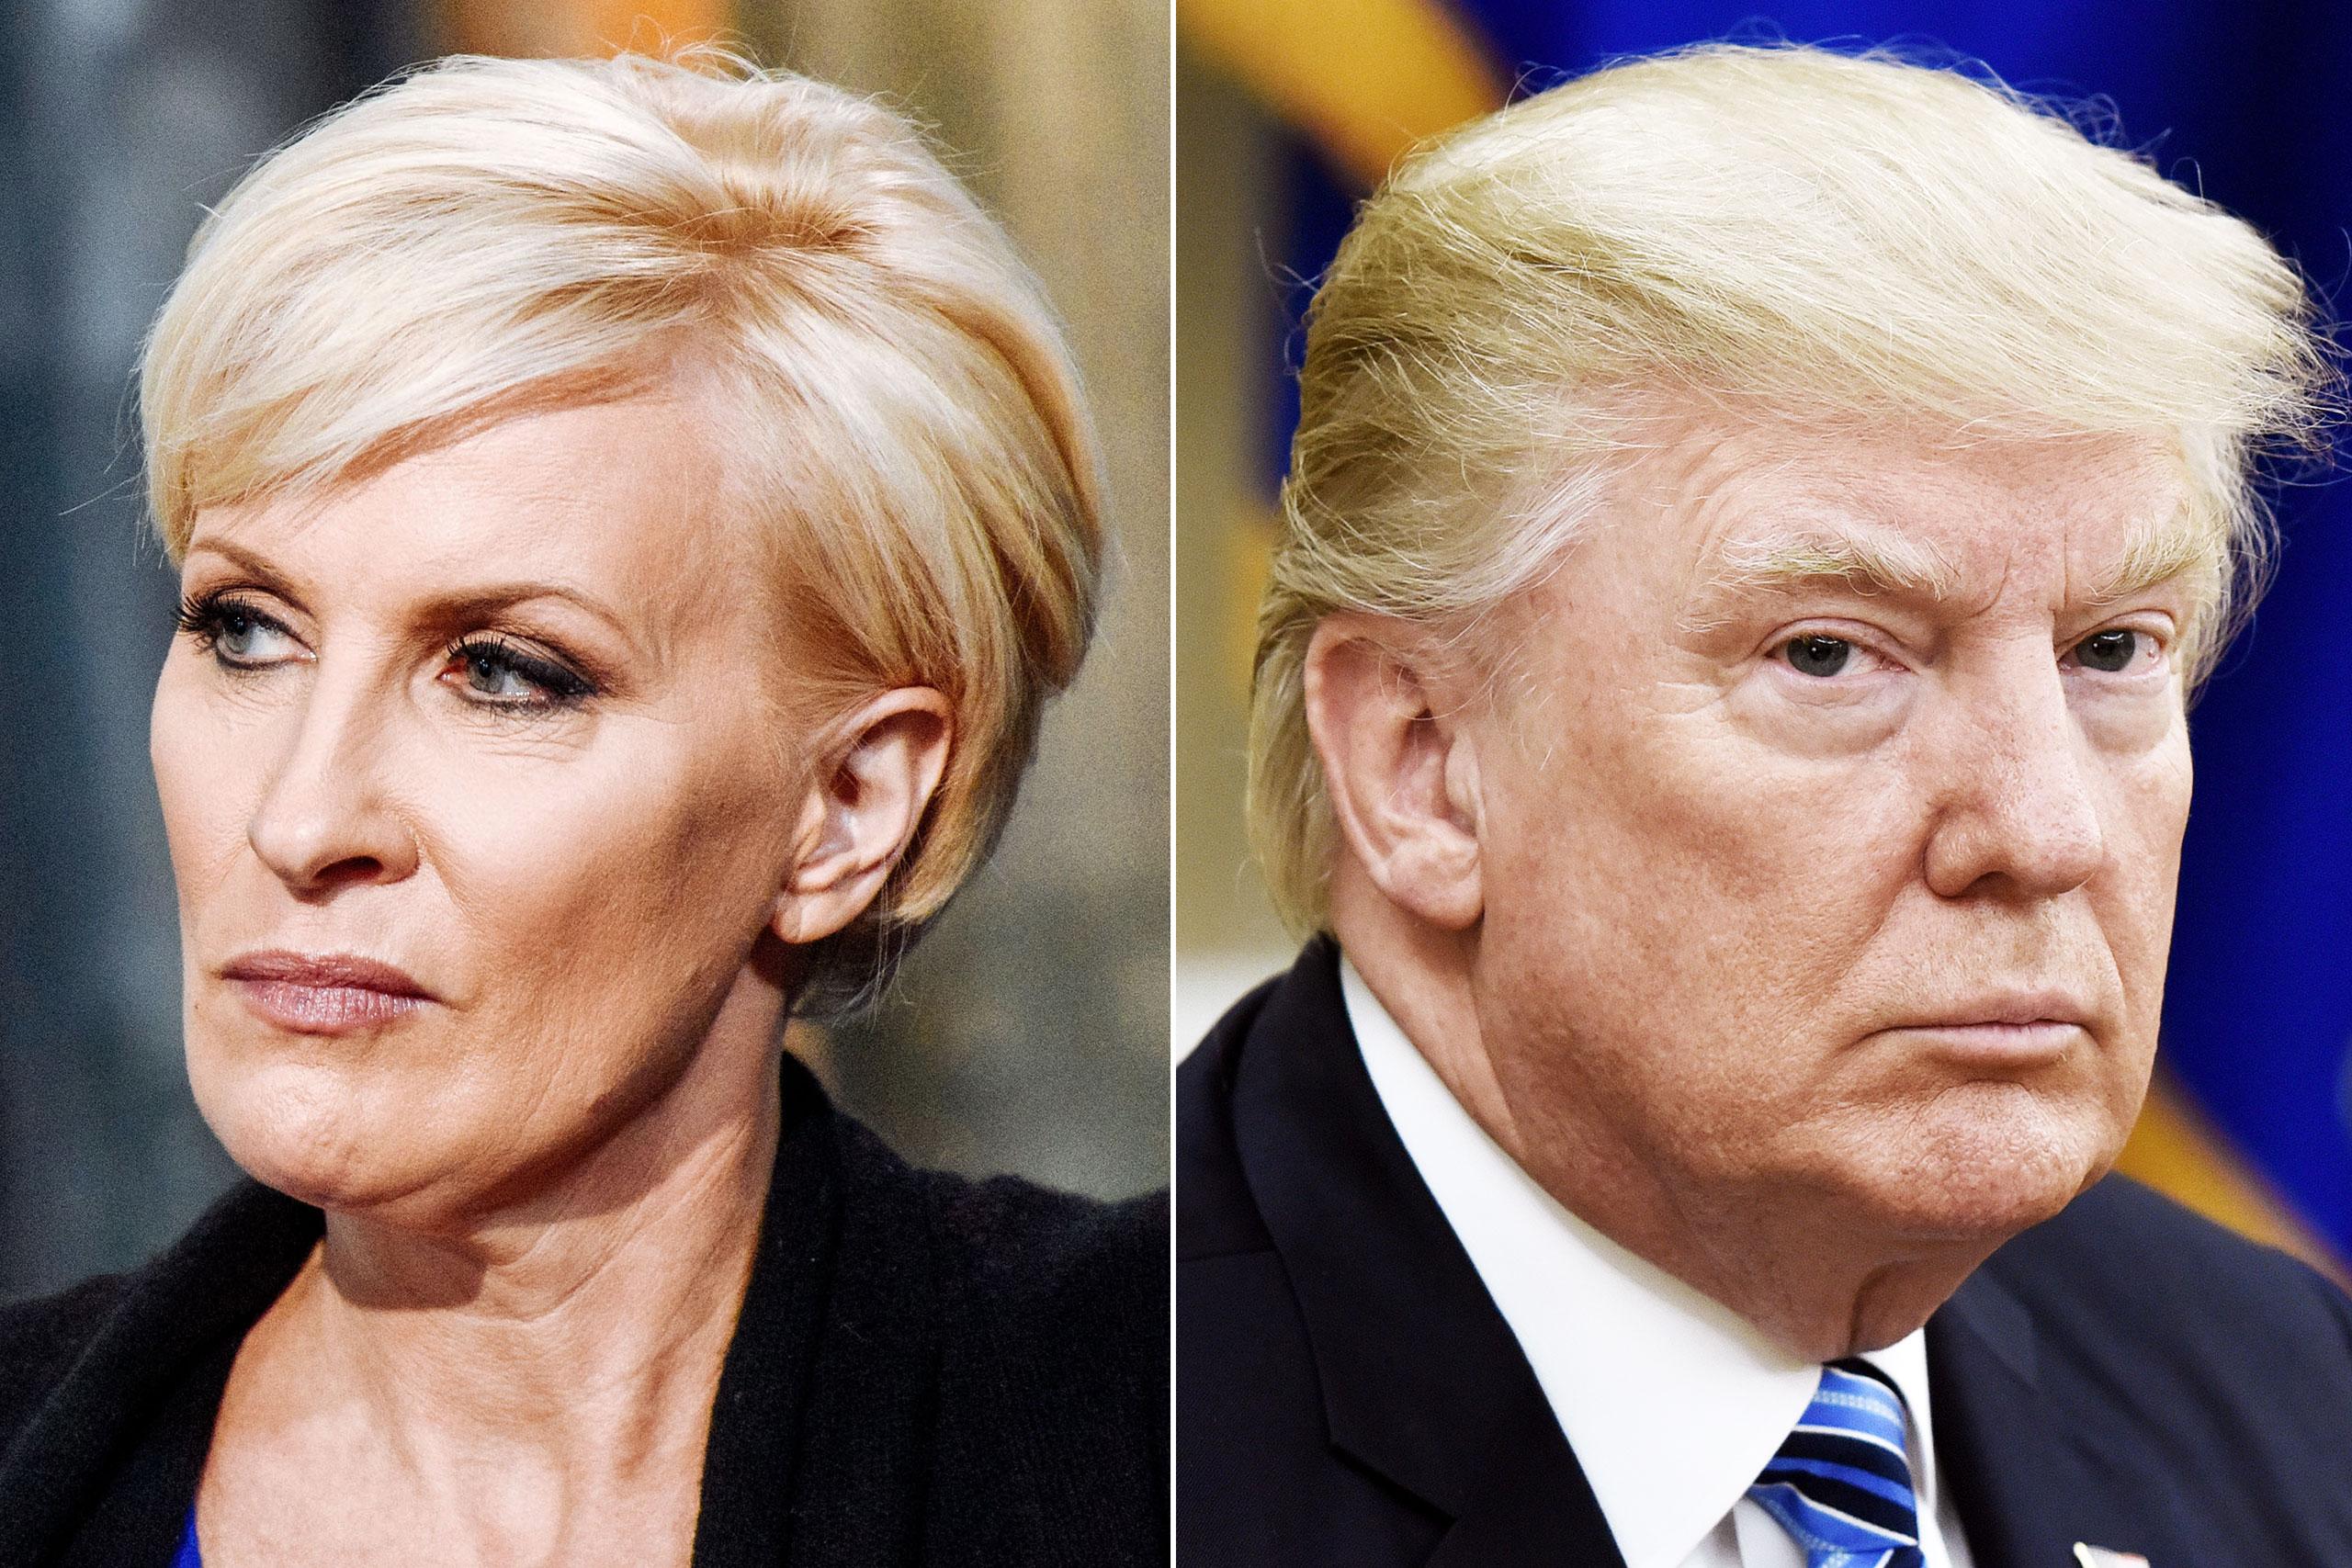 Mika Brzezinski in New York City on August 12, 2015 (L); Donald Trump in Washington, DC, on June 30, 2017.